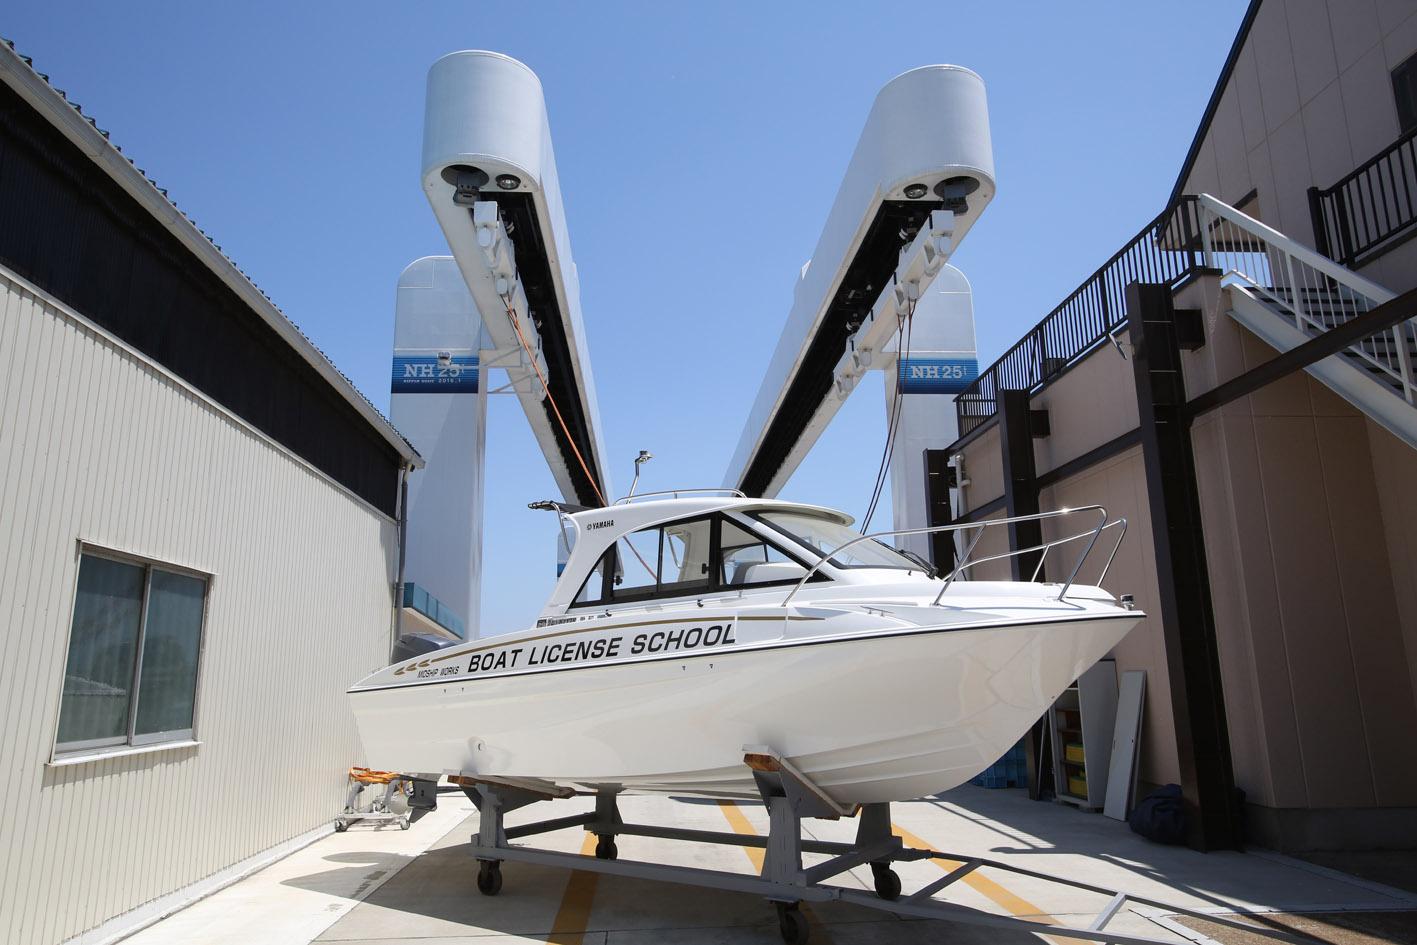 PWC基本コース 小型特殊国家試験受験 飛島マリン